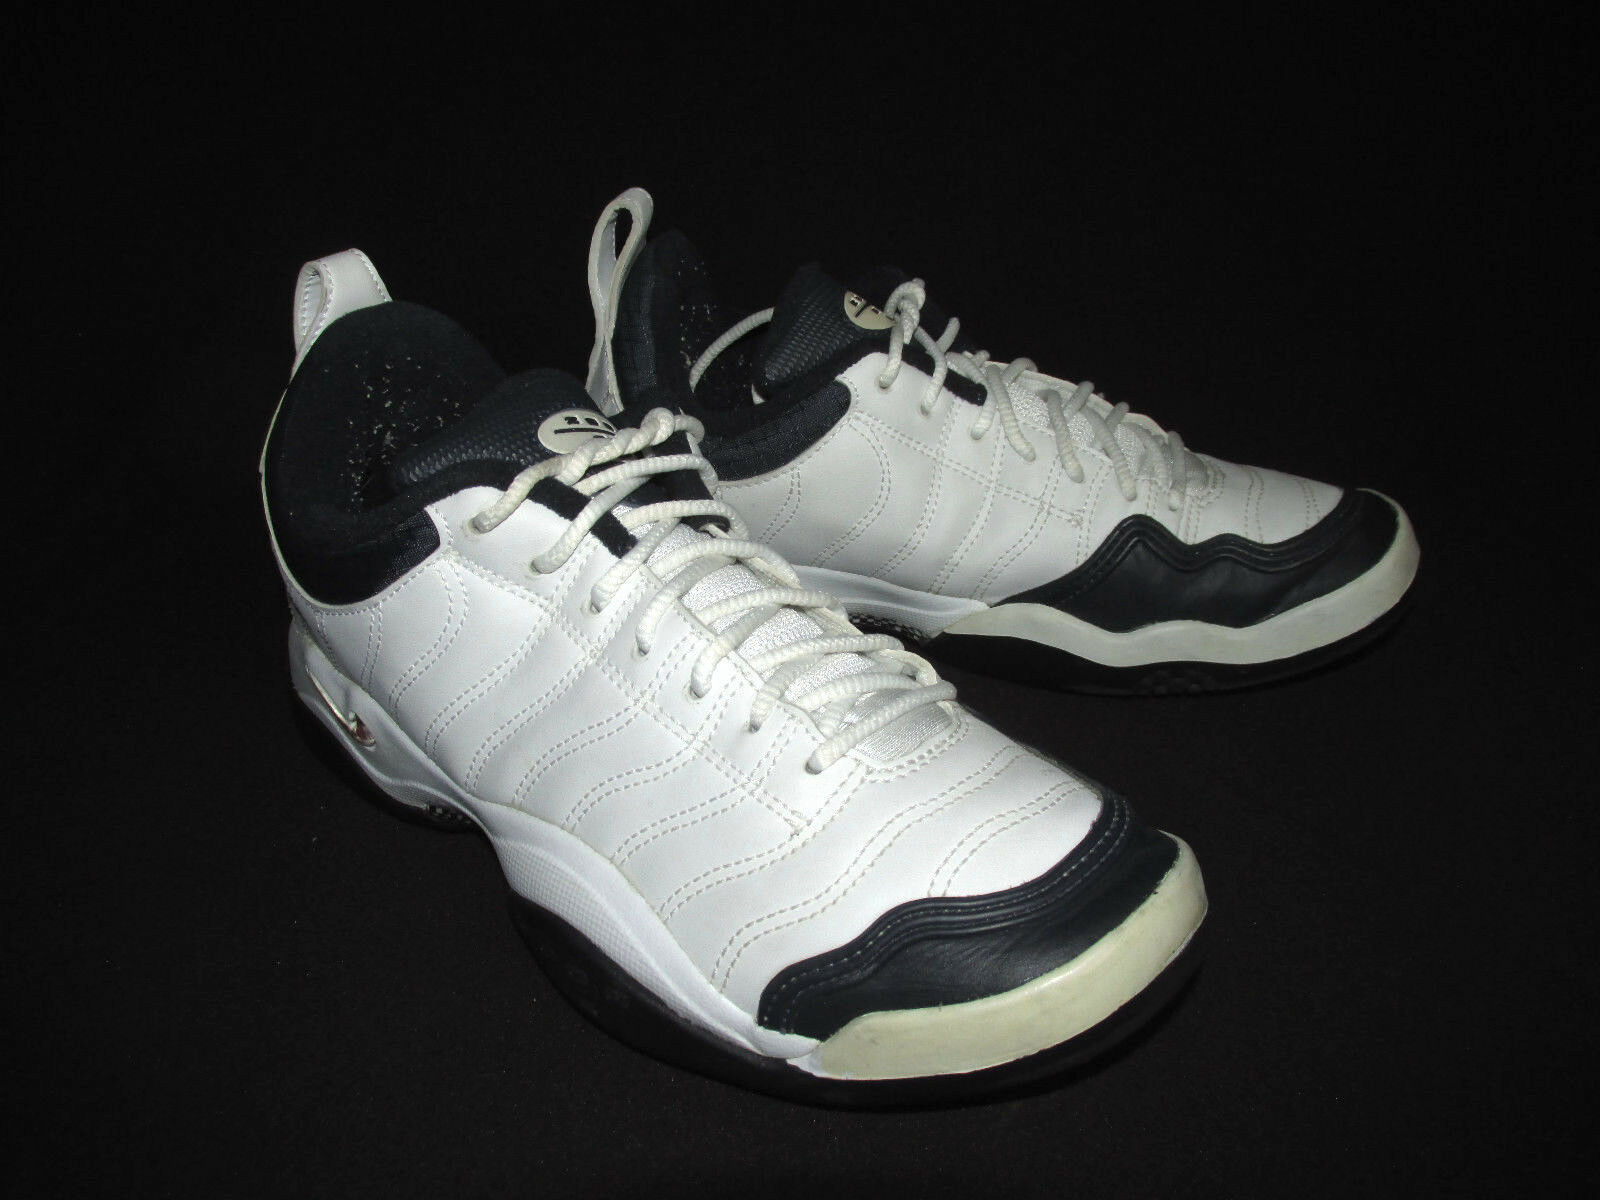 Nike Air Zoom Oscillate Mens Tennis Shoes 140370-144 White Black US 7.5M